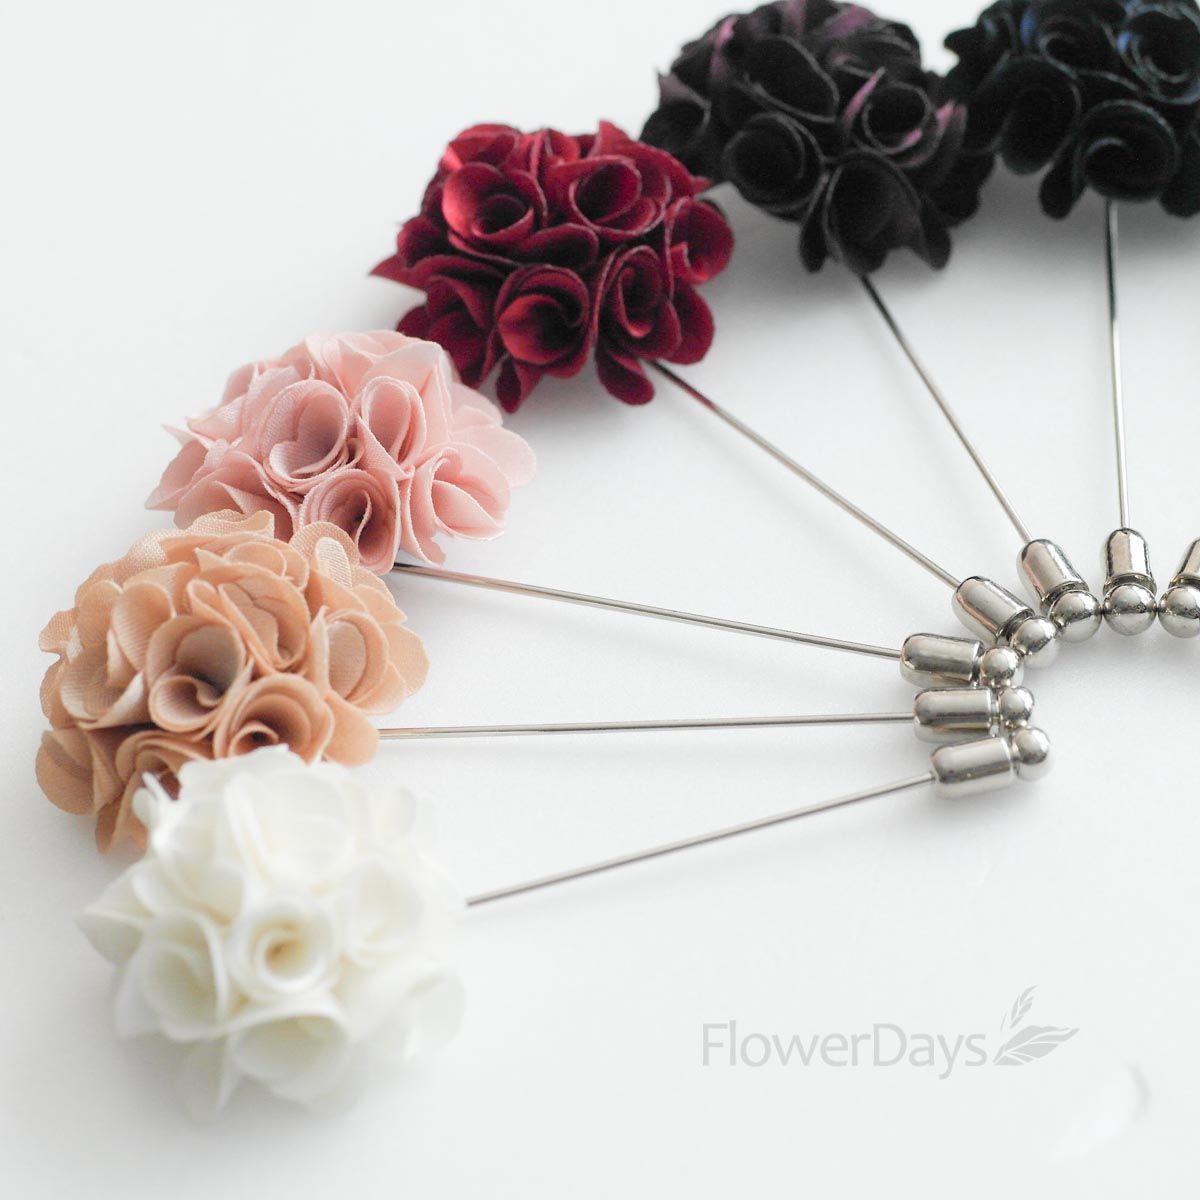 Satin Mini Bouquet MENS FLOWER Boutonniere Buttonhole For WeddingLAPEL PIN From Petallikelove